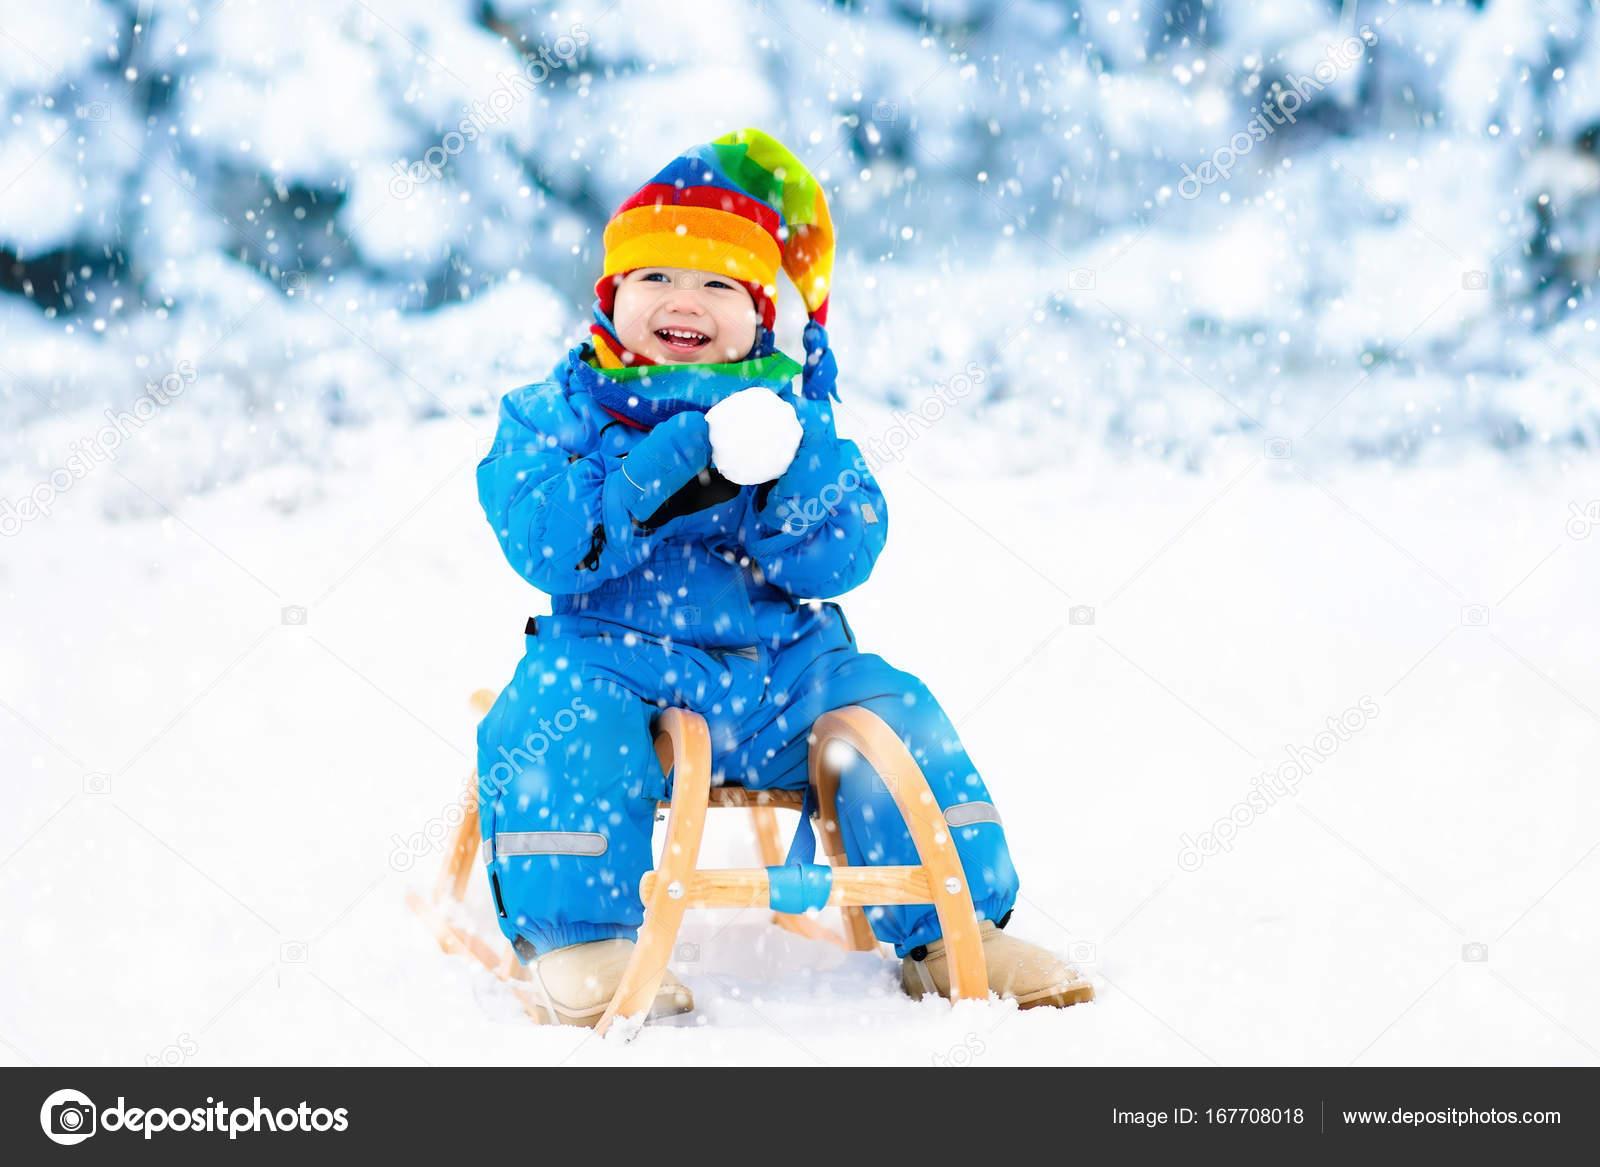 Christmas Vacation Sled.Boy On Sleigh Ride Child Sledding Kid With Sledge Stock